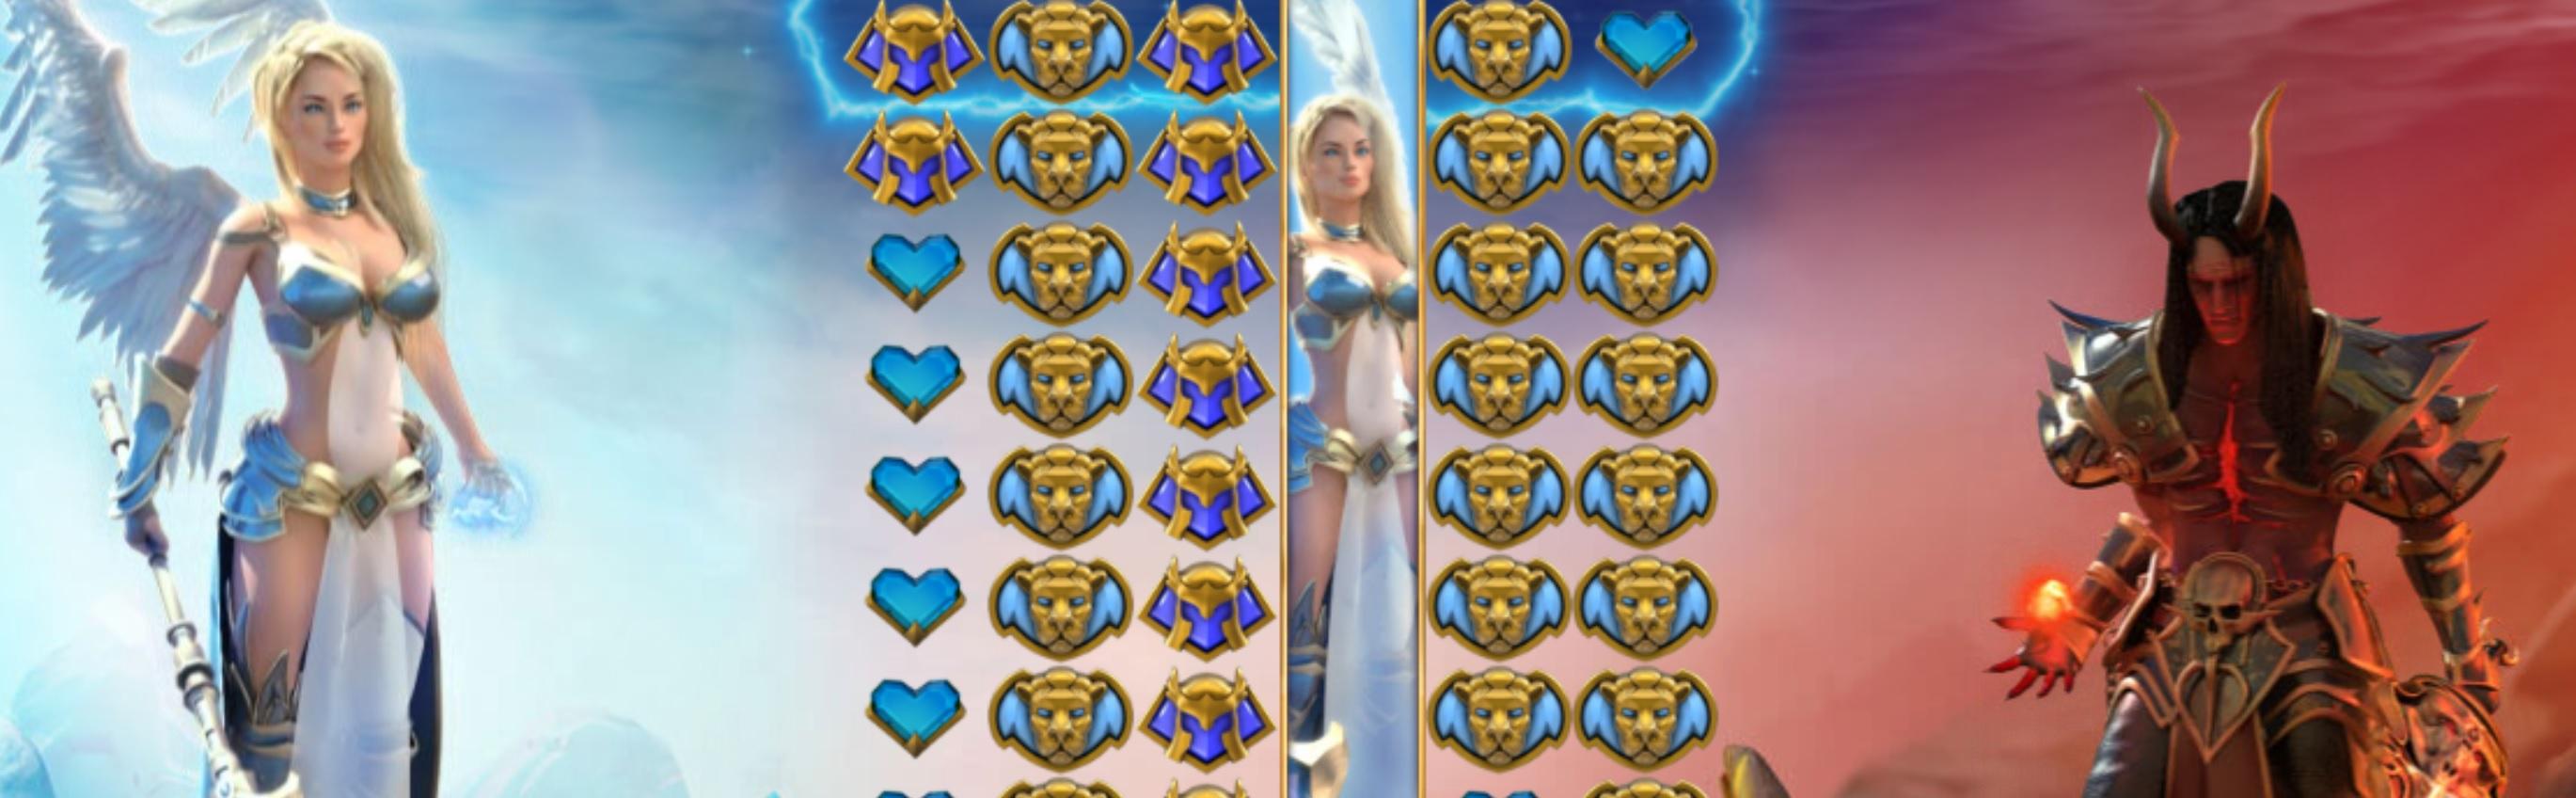 Archangels Salvation Slot from NetEnt